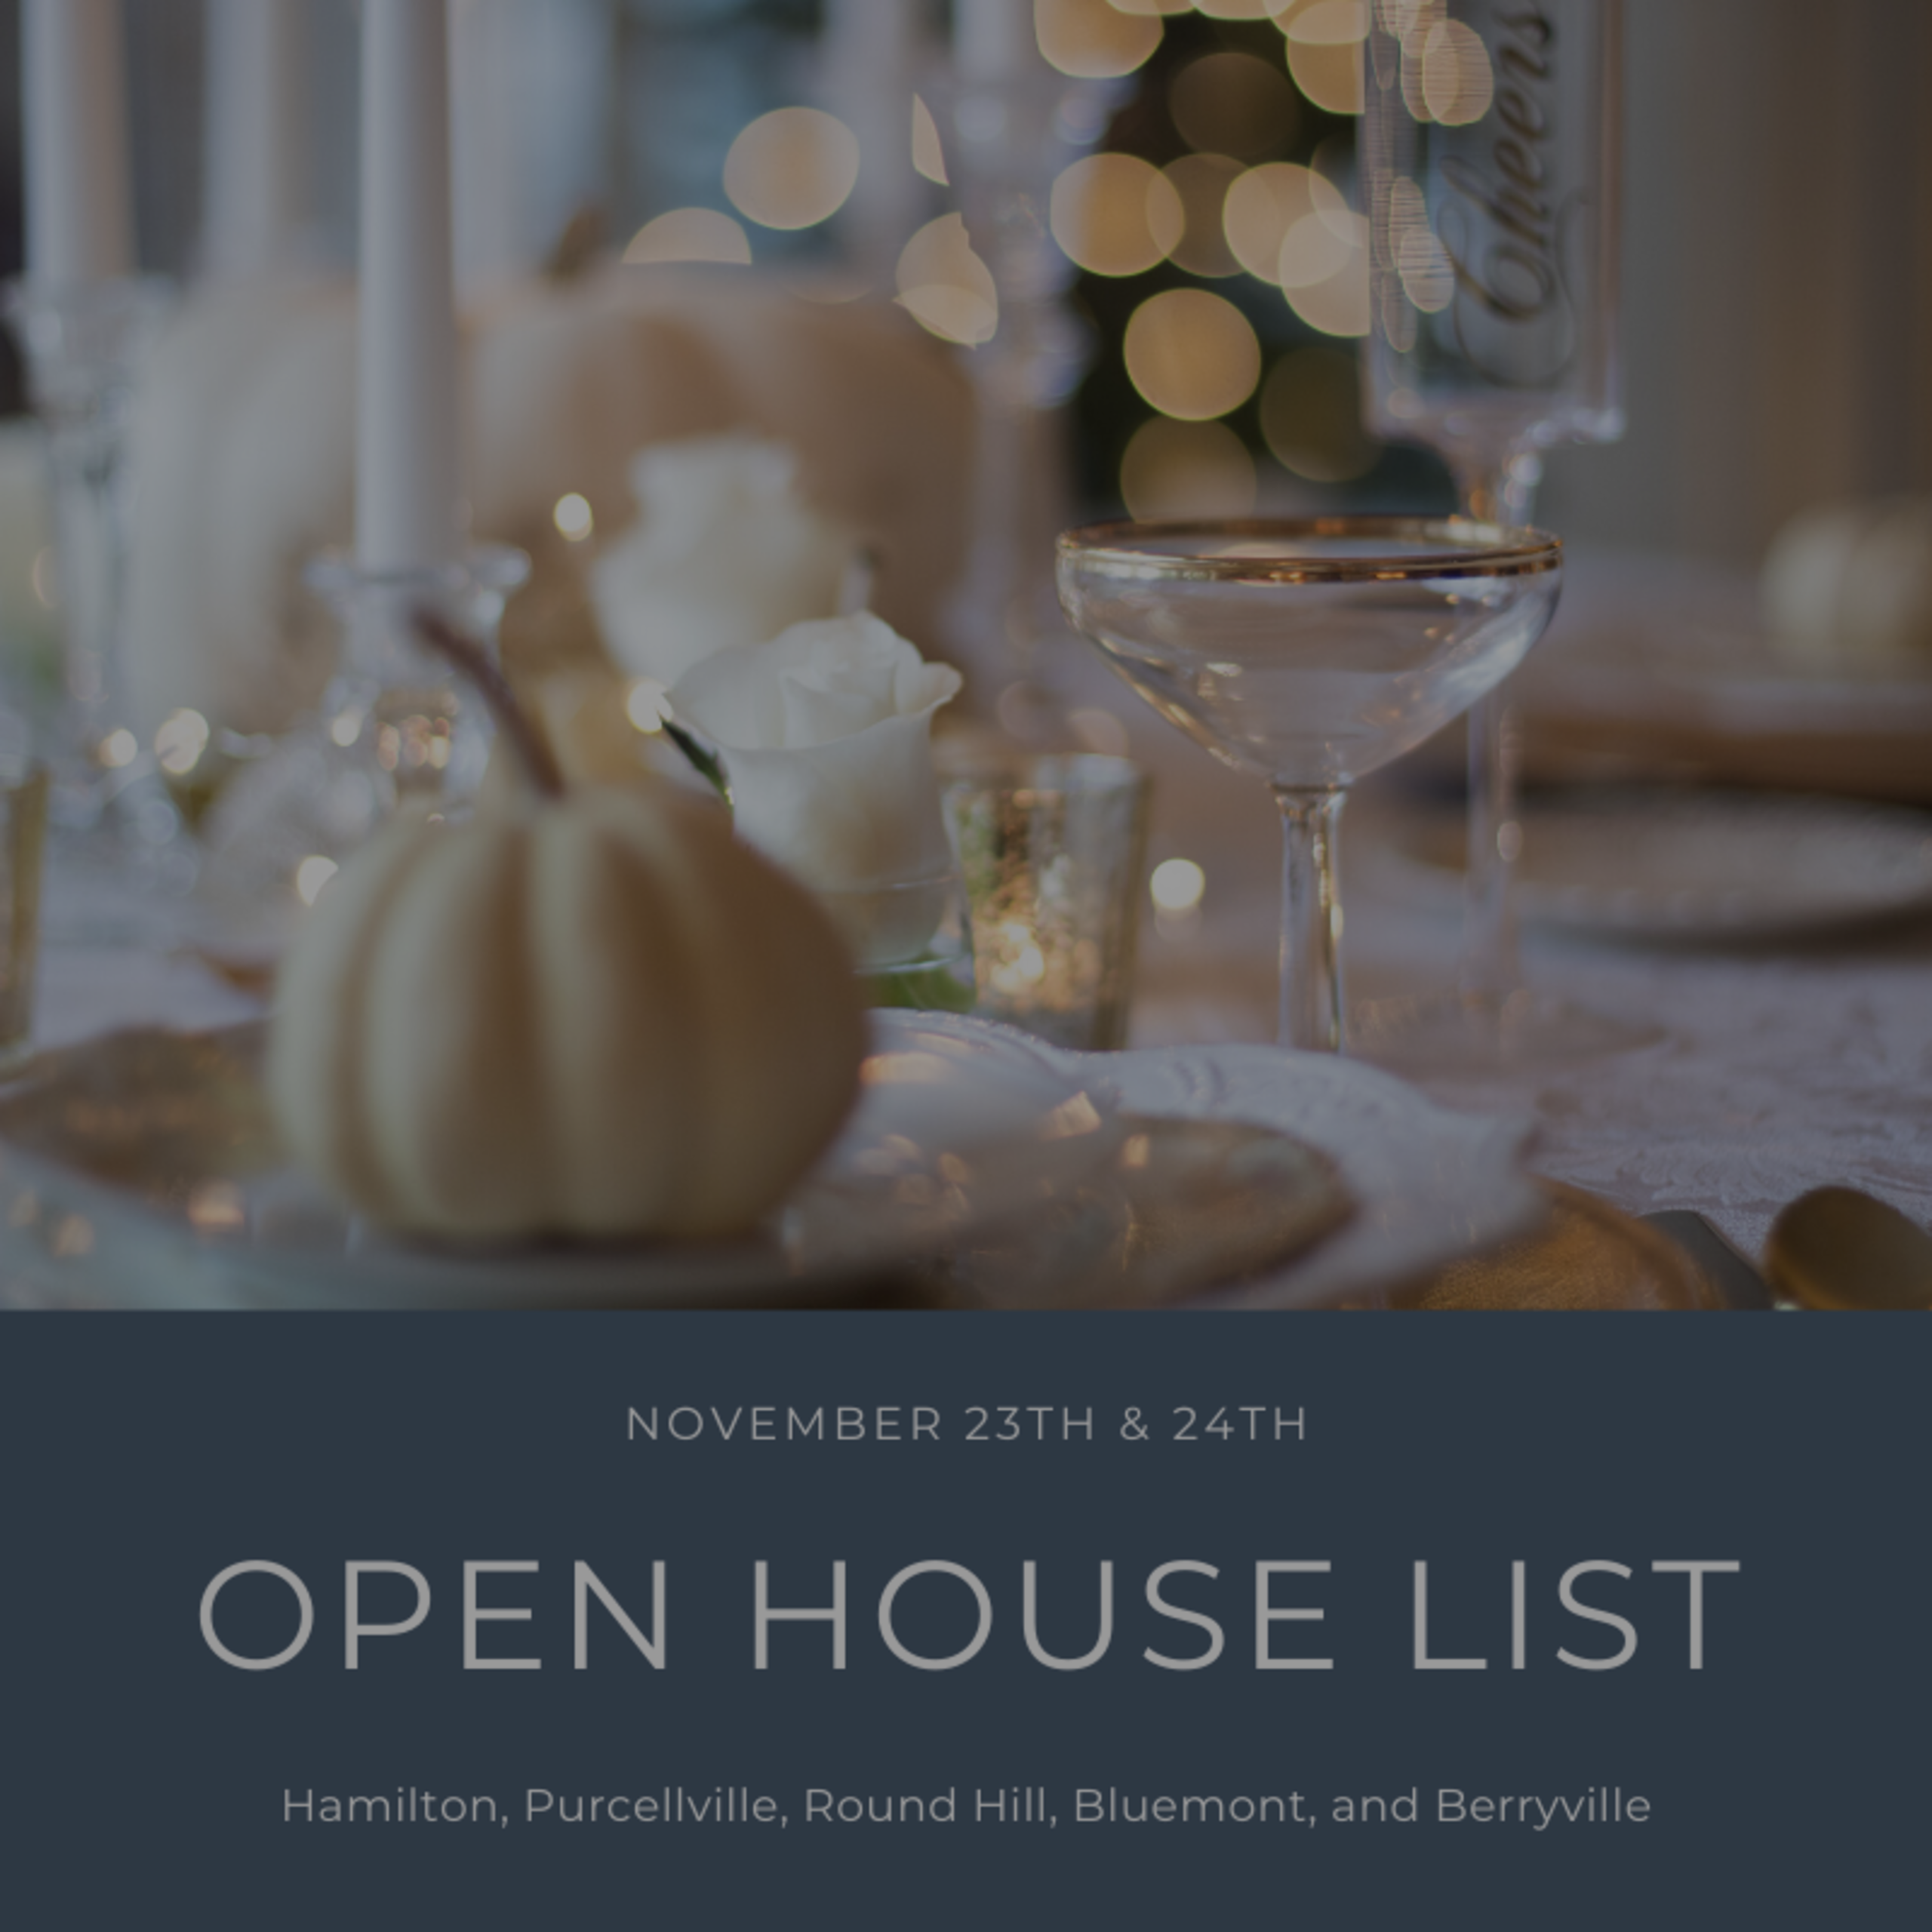 Open House List 11/23/19 – 11/24/19